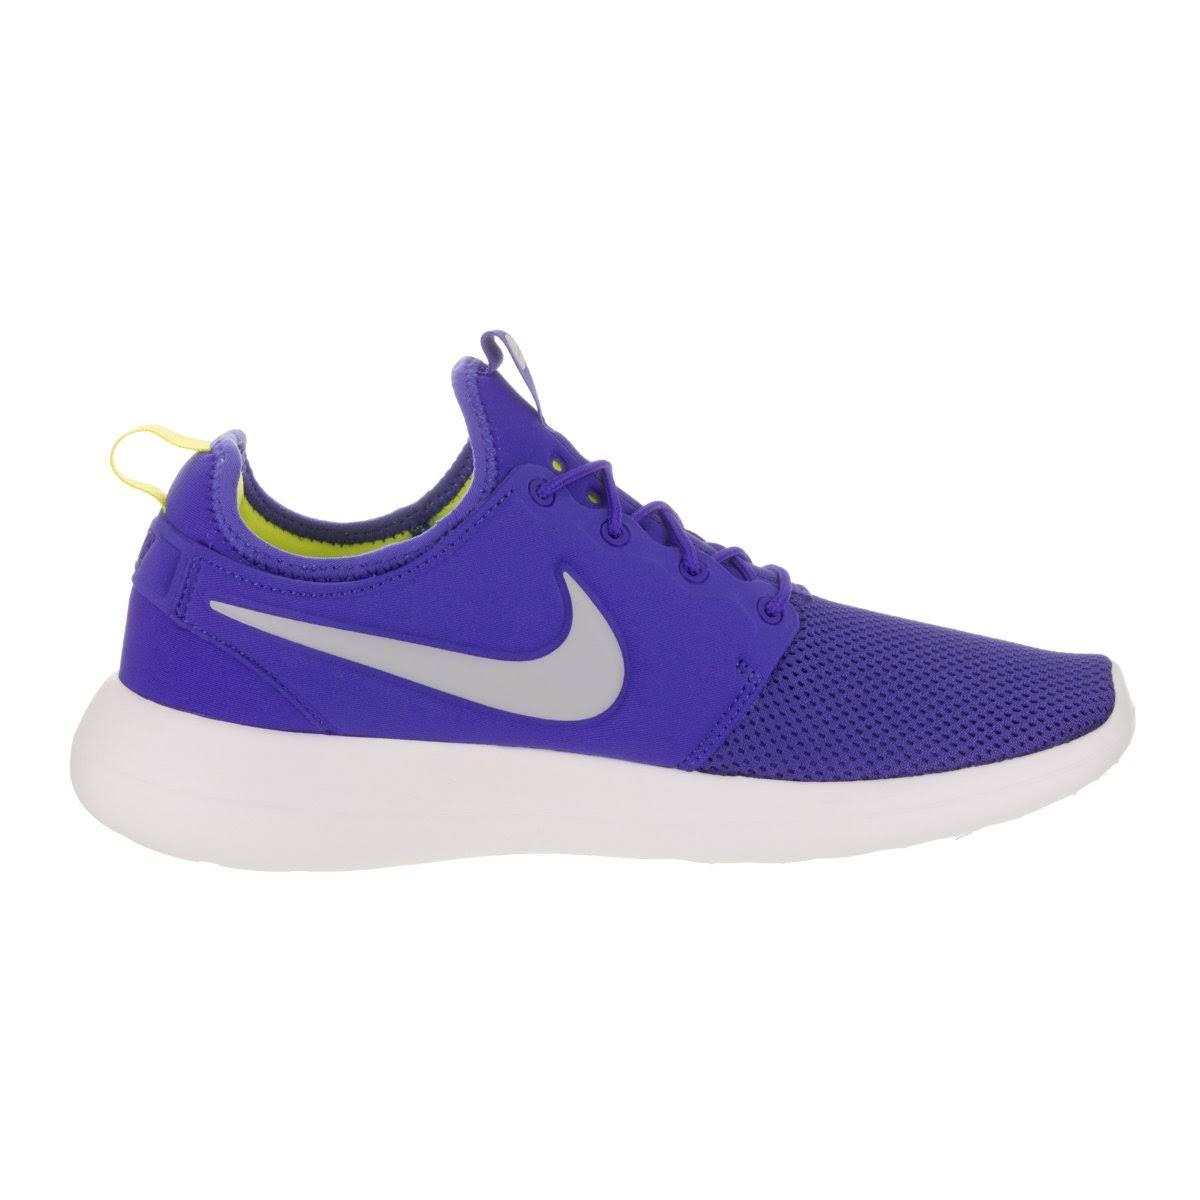 11 Herrenschuhe Grey Blue Größe Roshe Nike 844656401 Wolf Two Paramount w7zXUqE